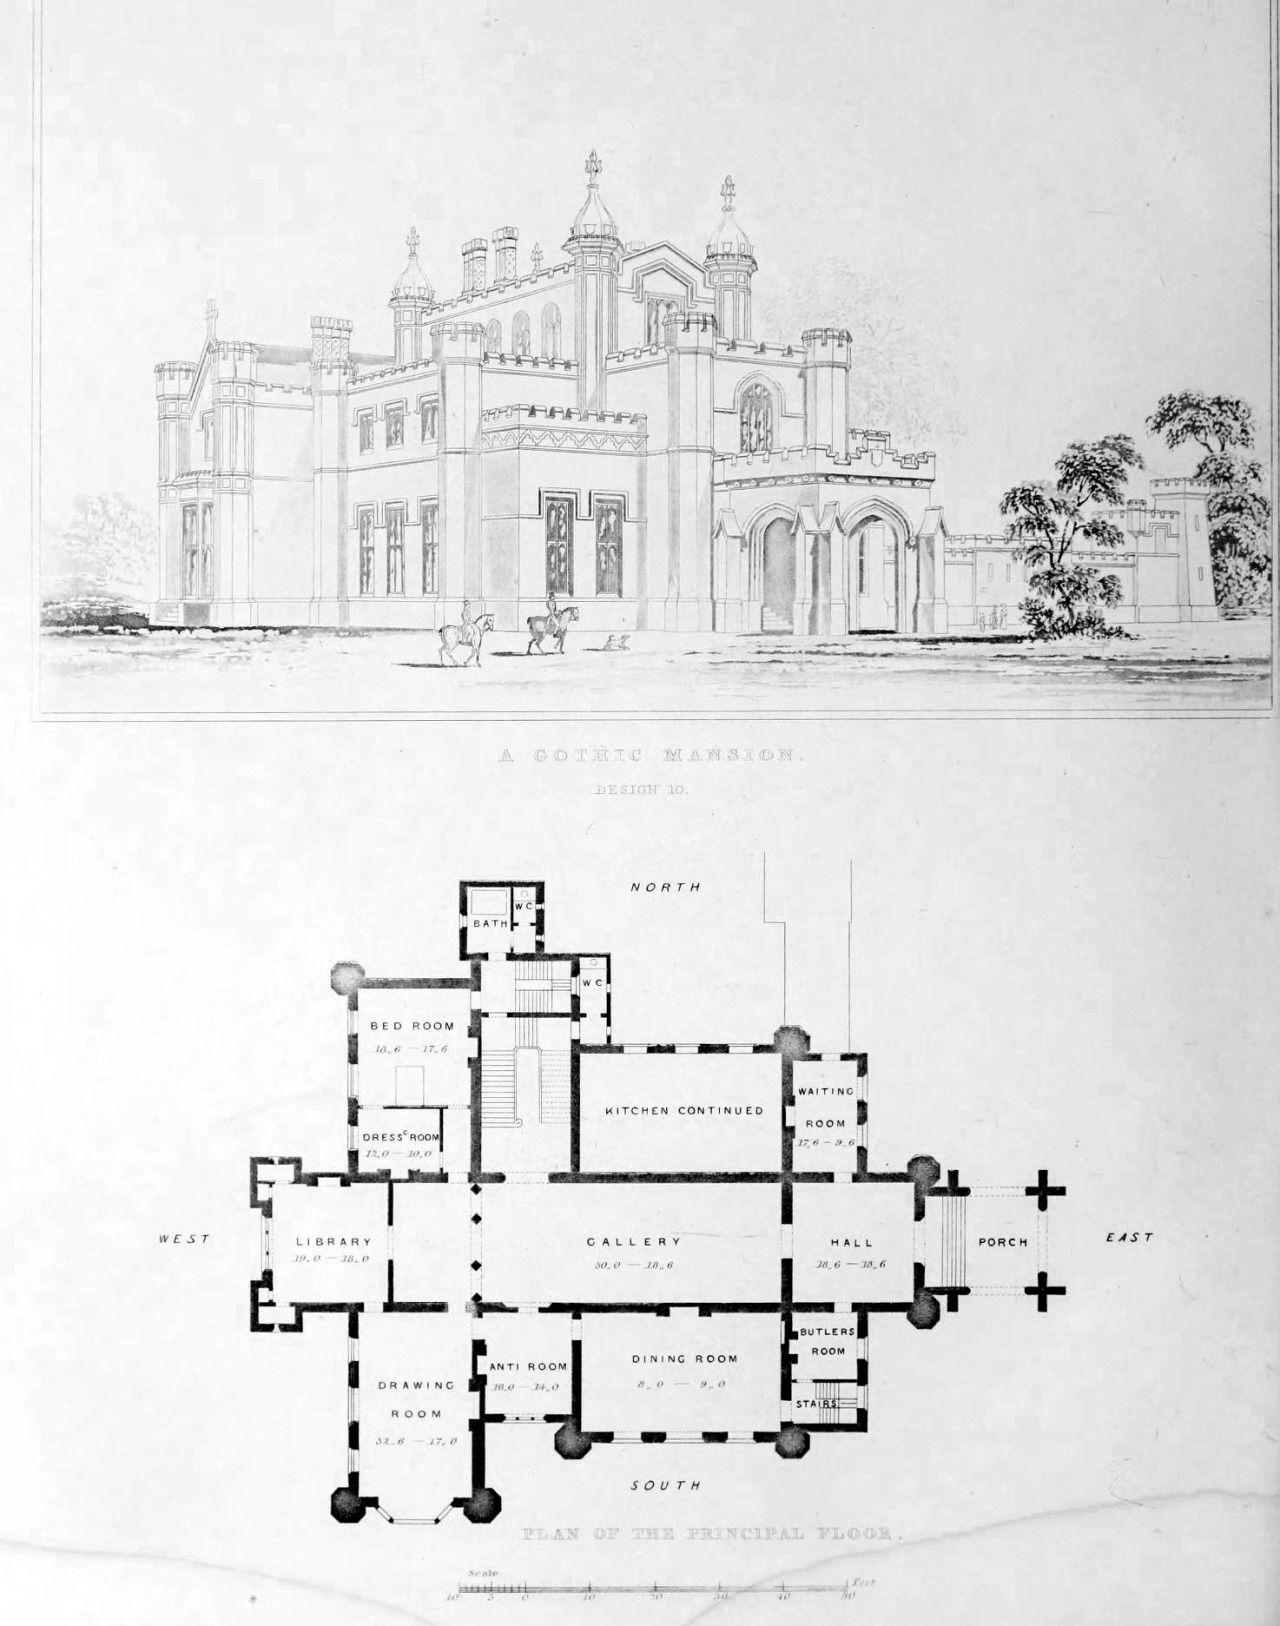 Archi X2f Maps Photo Architectural Floor Plans Vintage House Plans Mansion Floor Plan